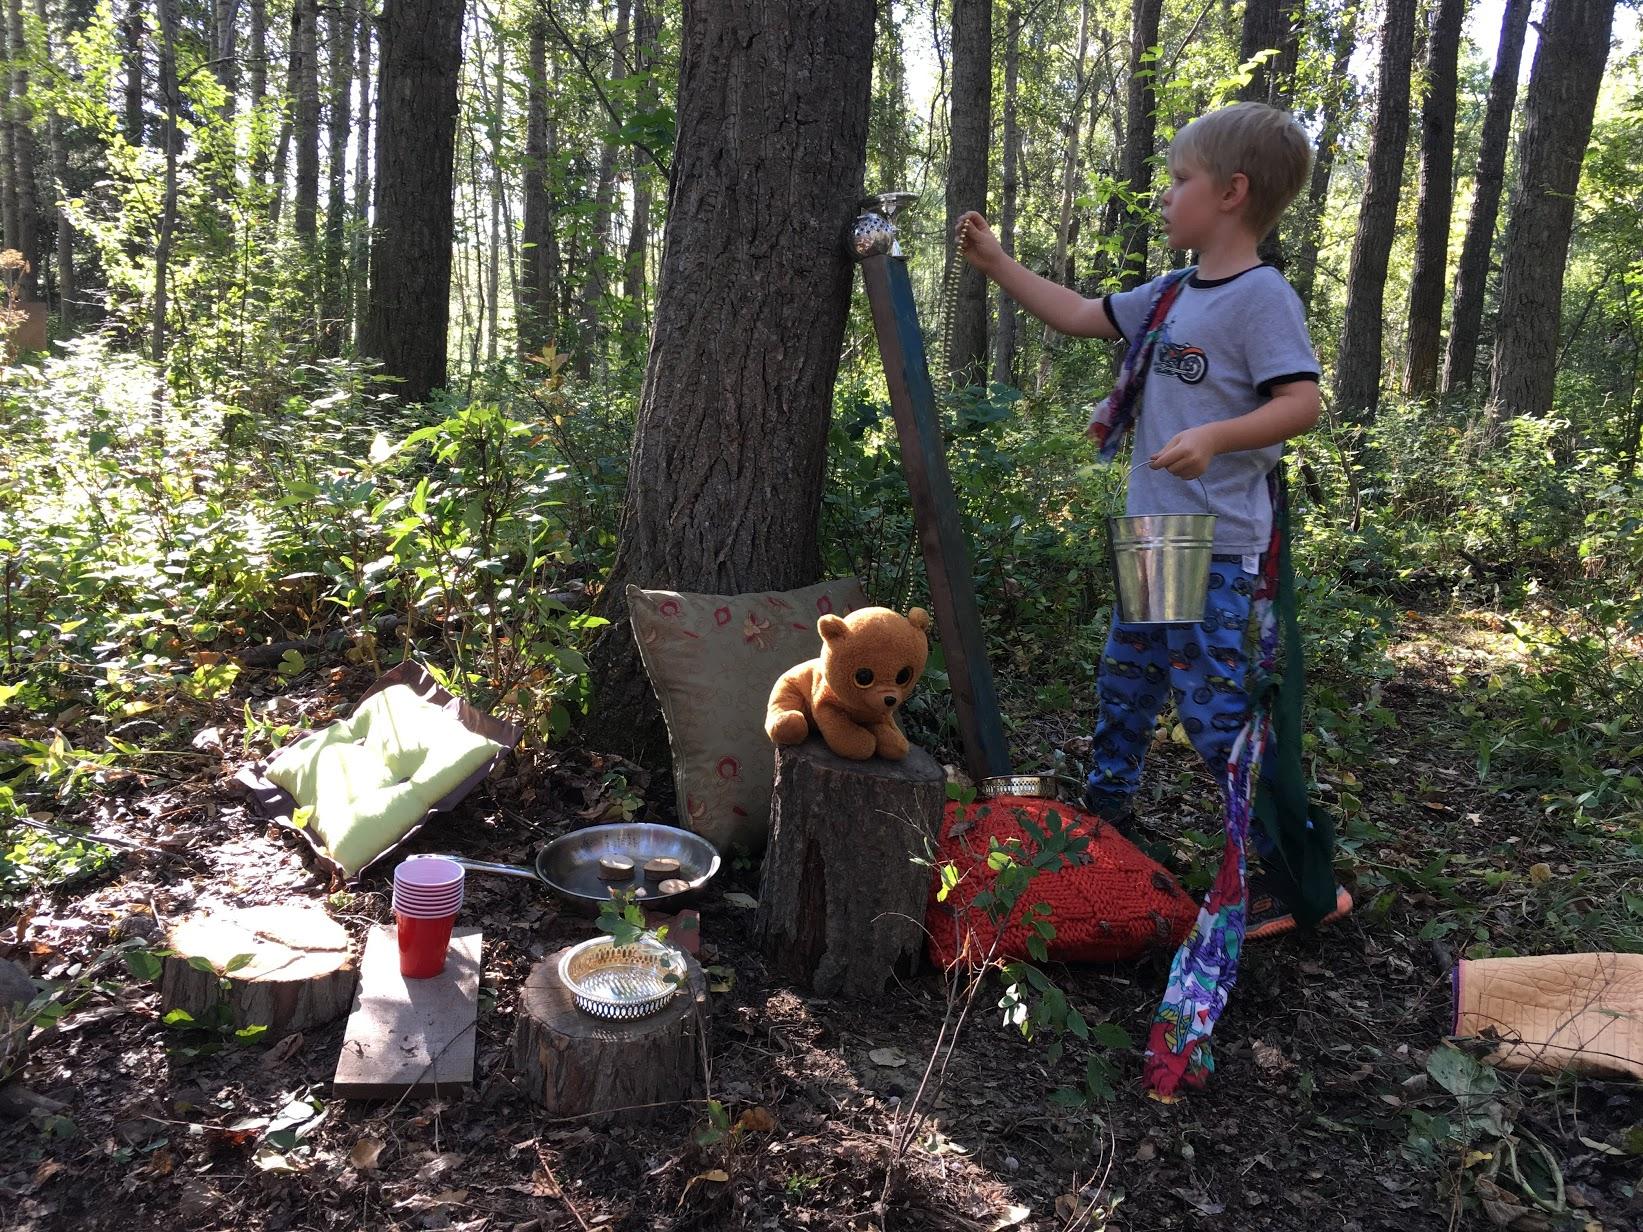 Friends in the Wild - Summer Camp